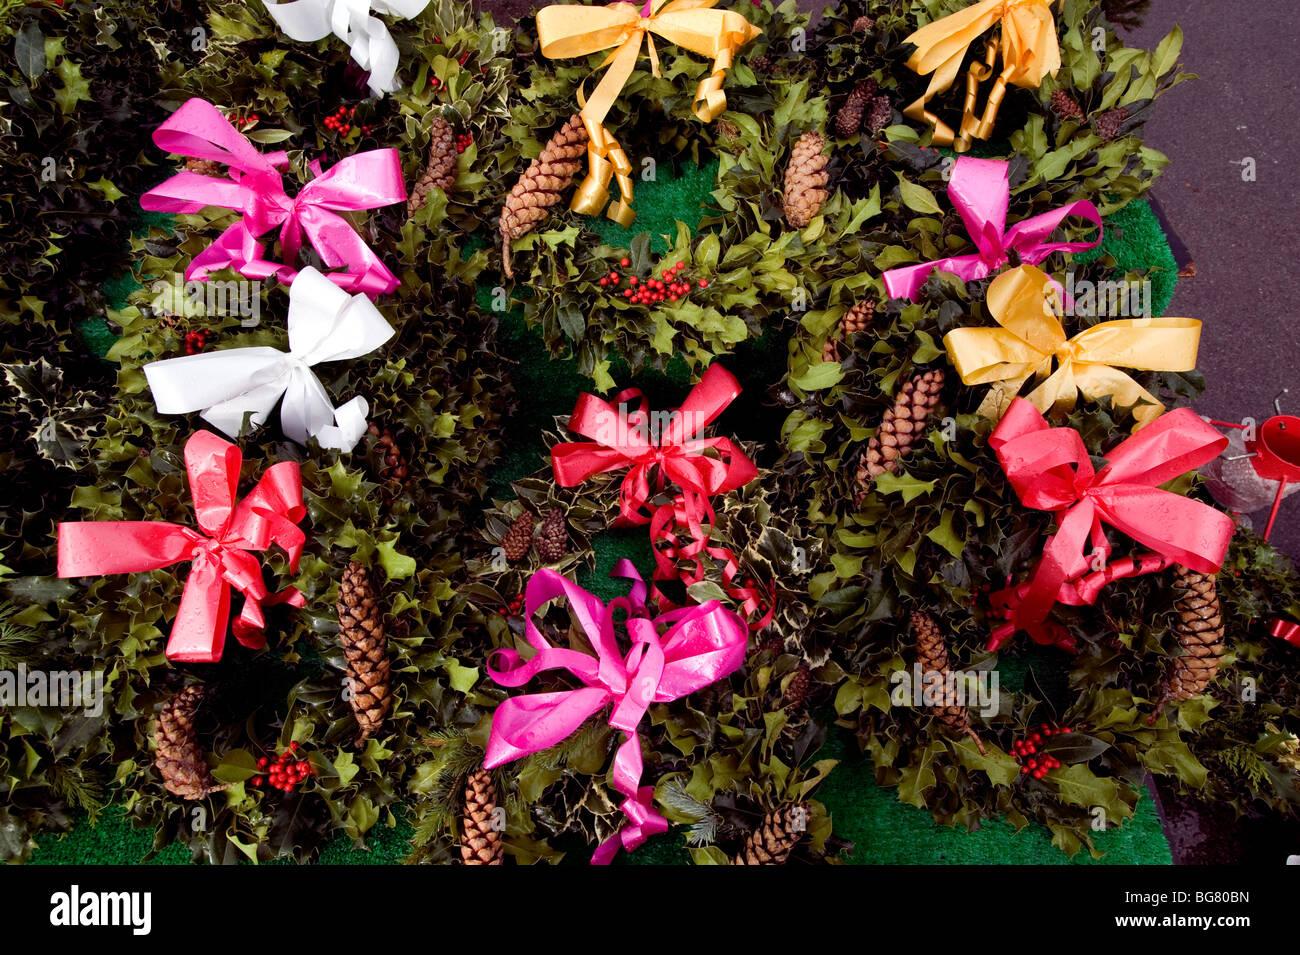 Christmas 2009. Over the top bad taste Christmas wreaths. - Stock Image